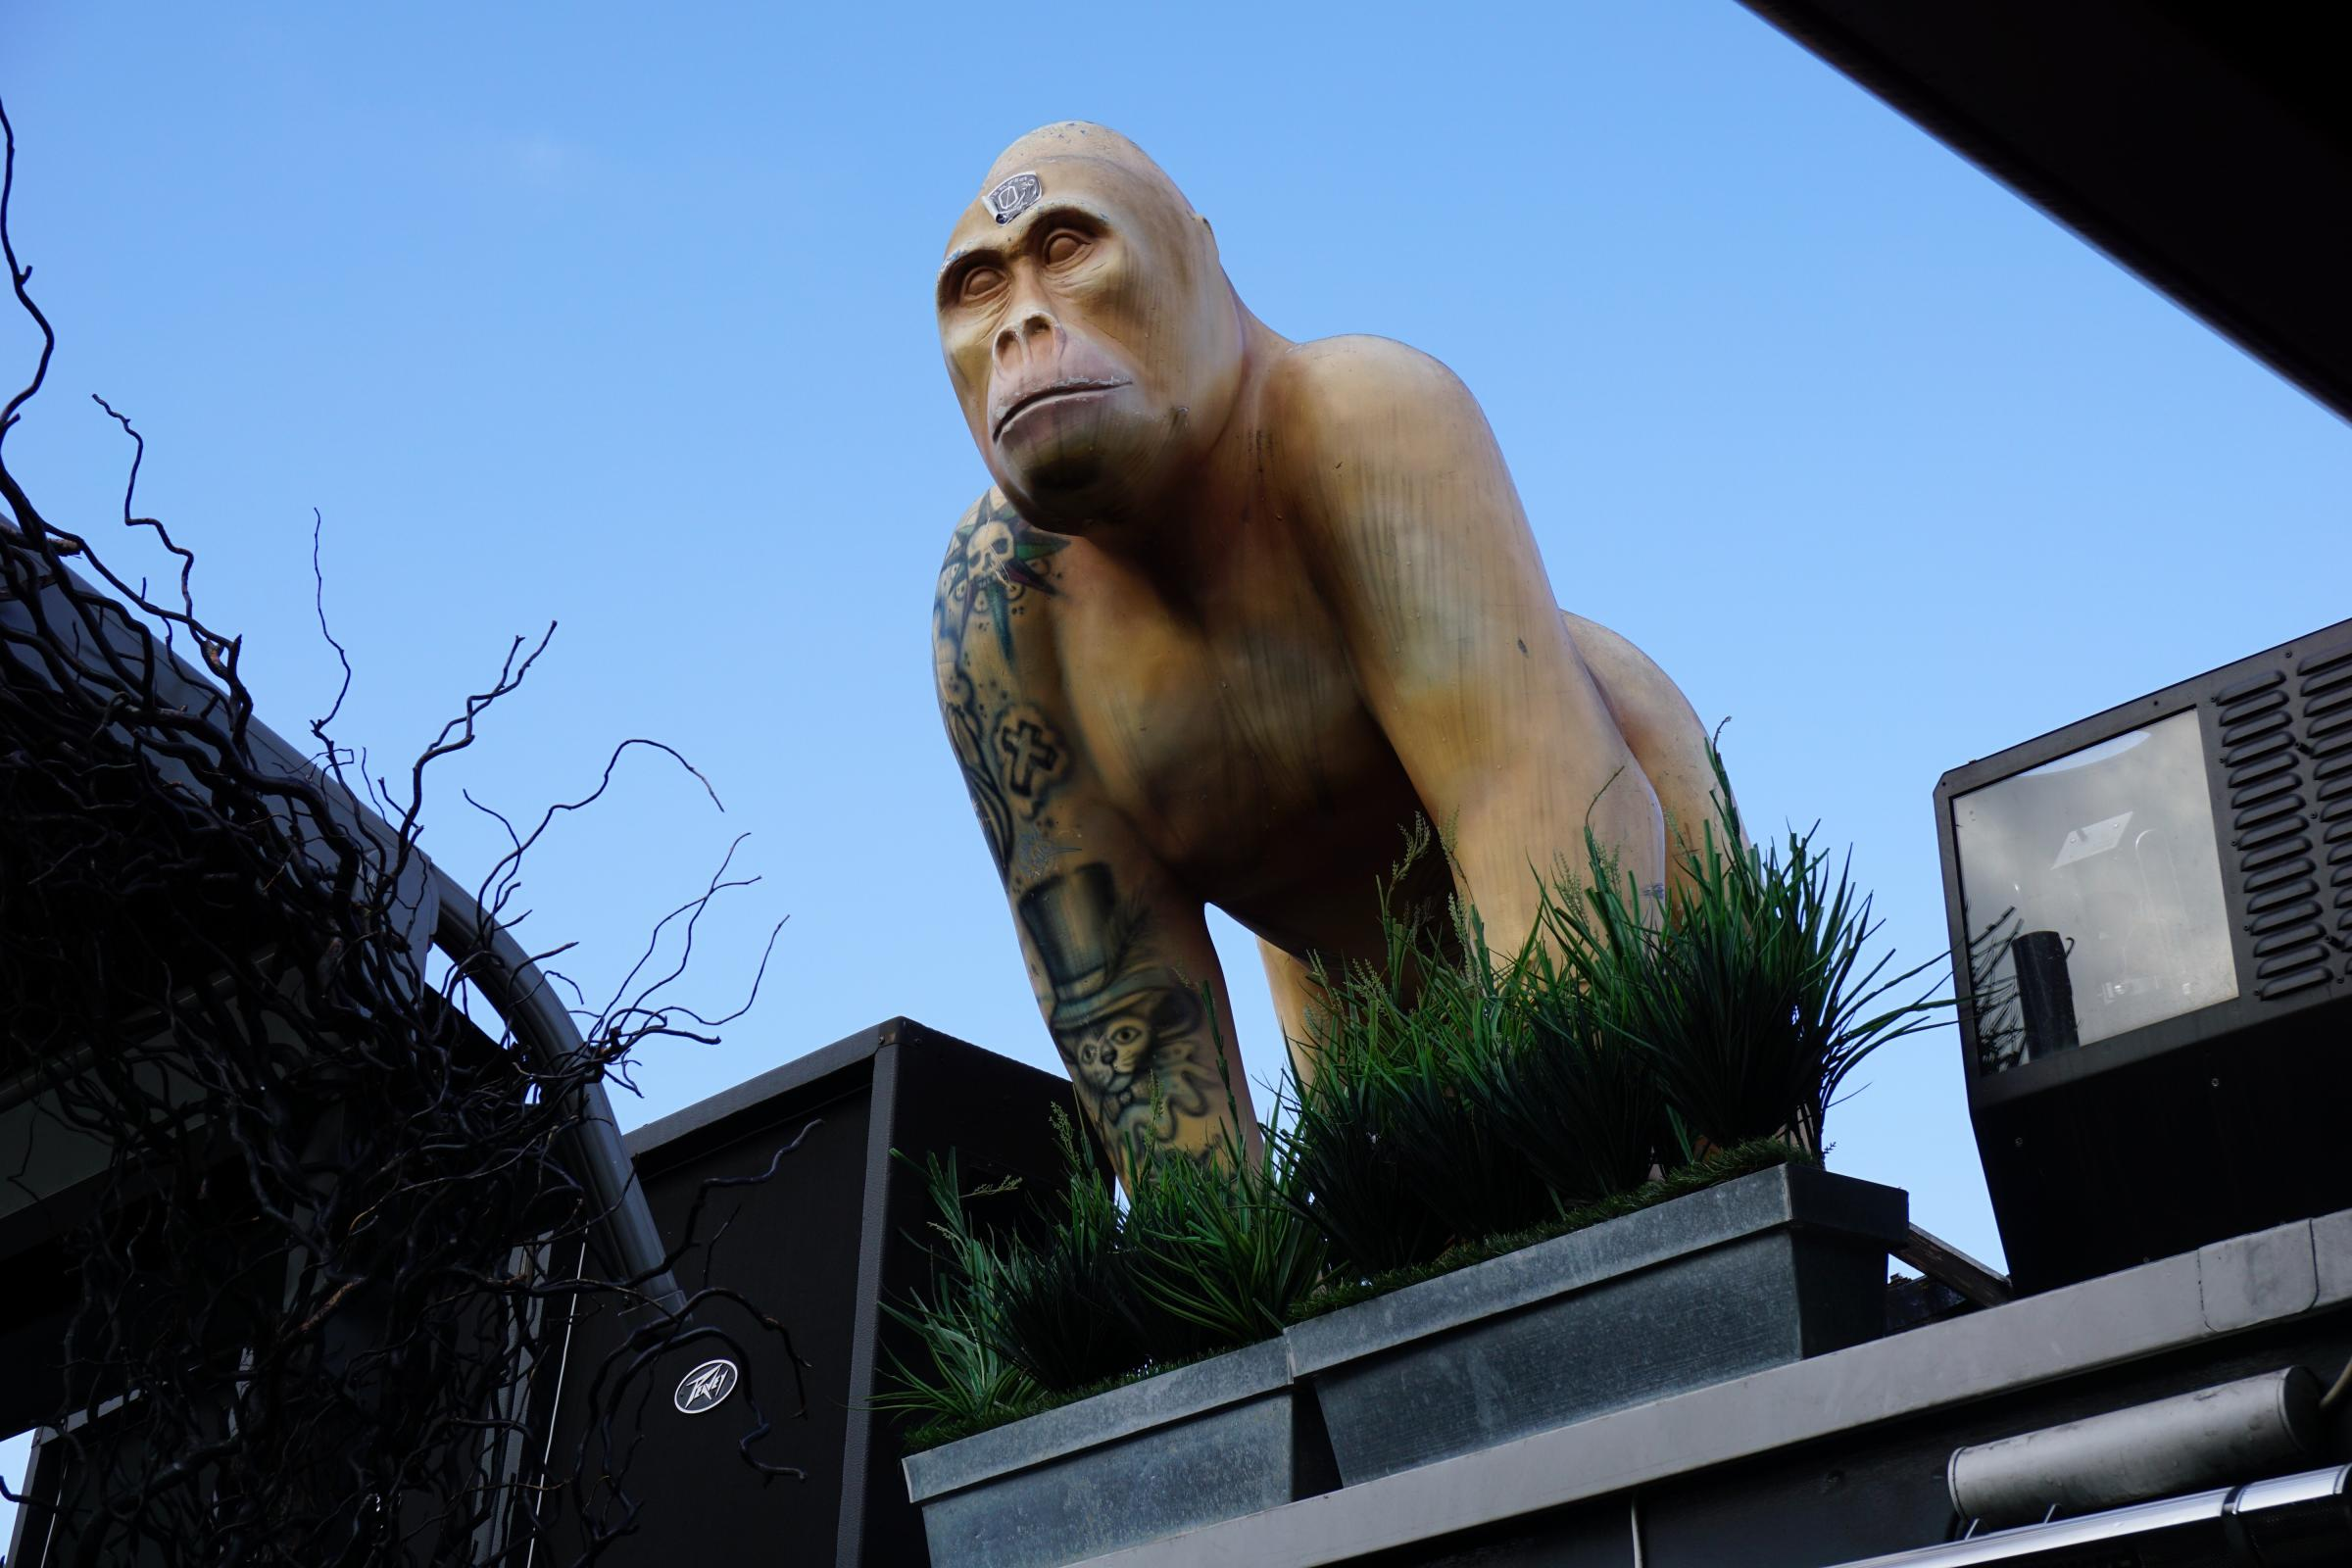 Giant gorilla statue stolen from London hotel